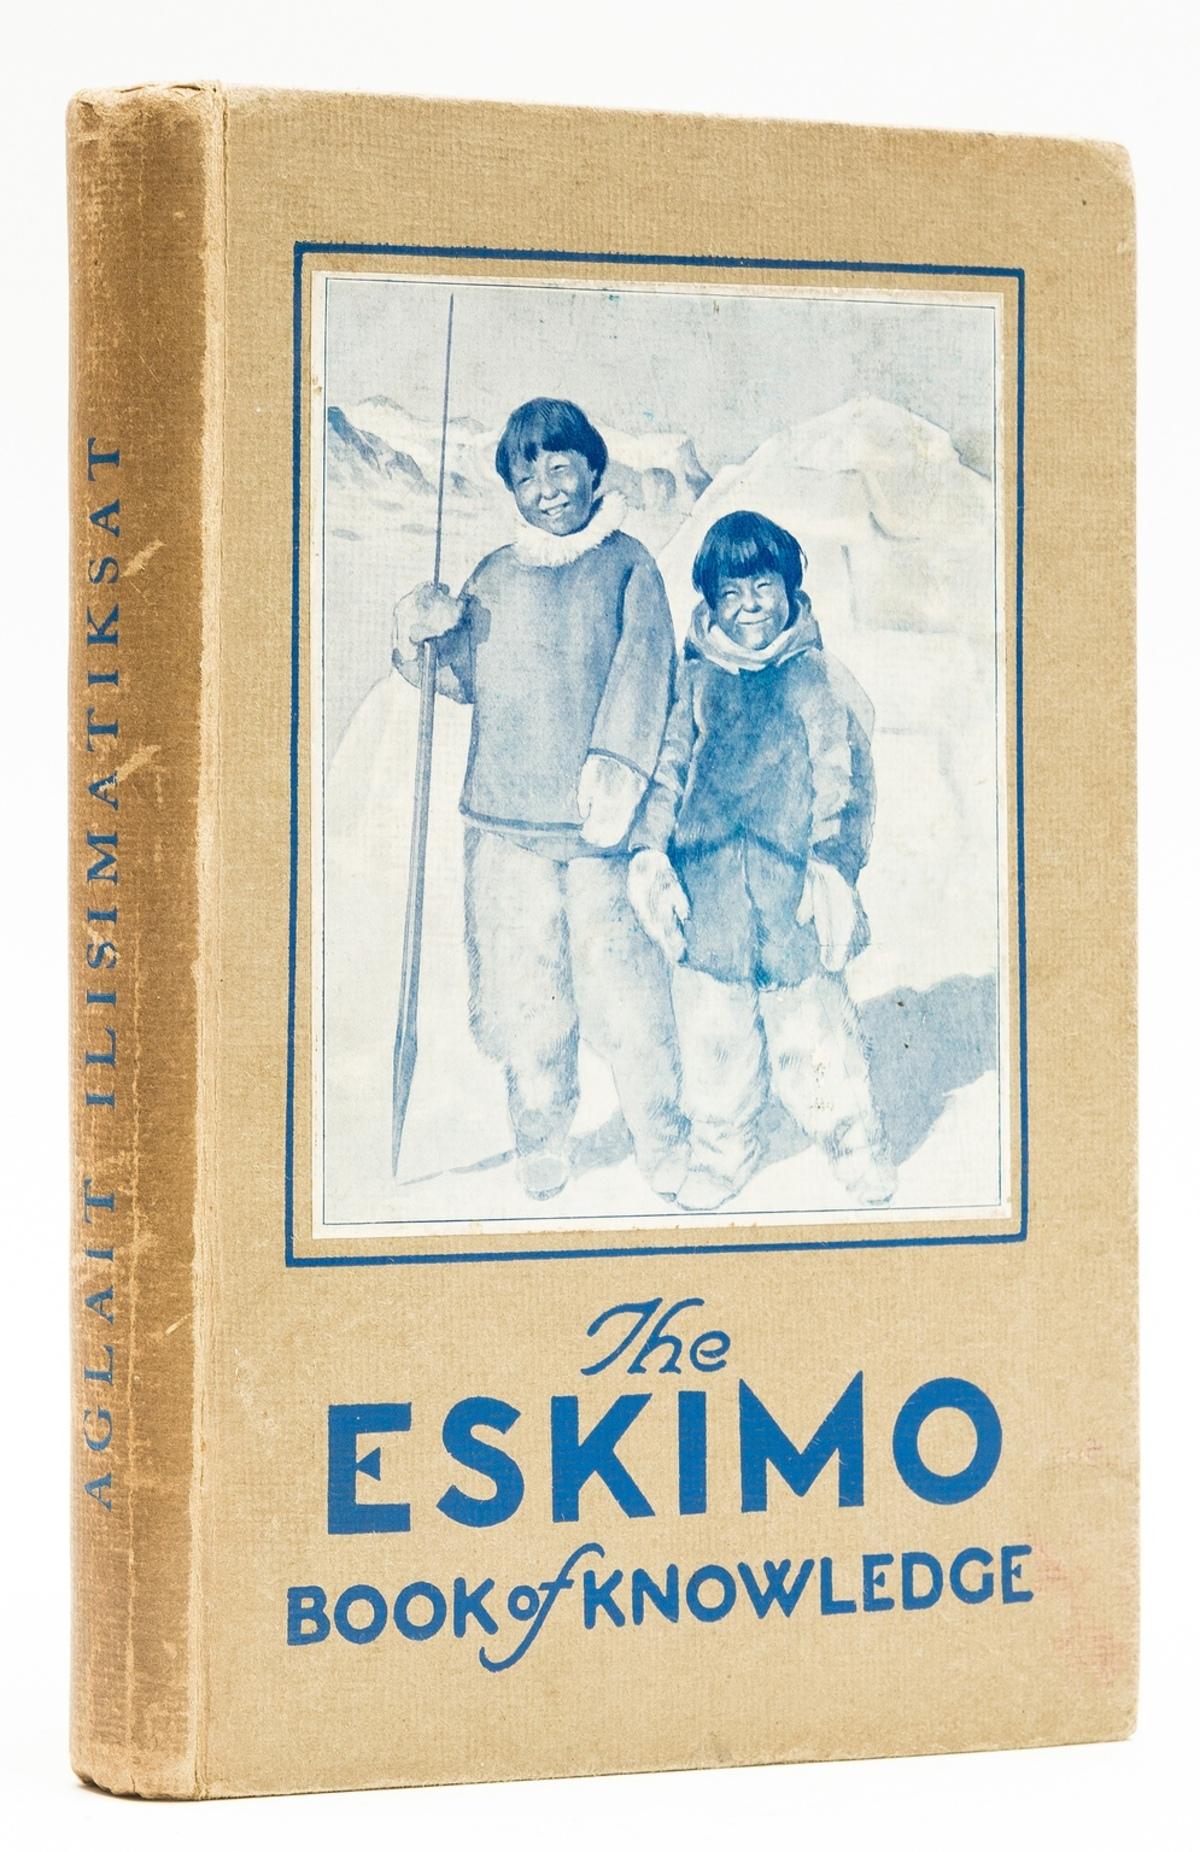 Polar.- Binney (George) The Eskimo Book of Knowledge, 1931.